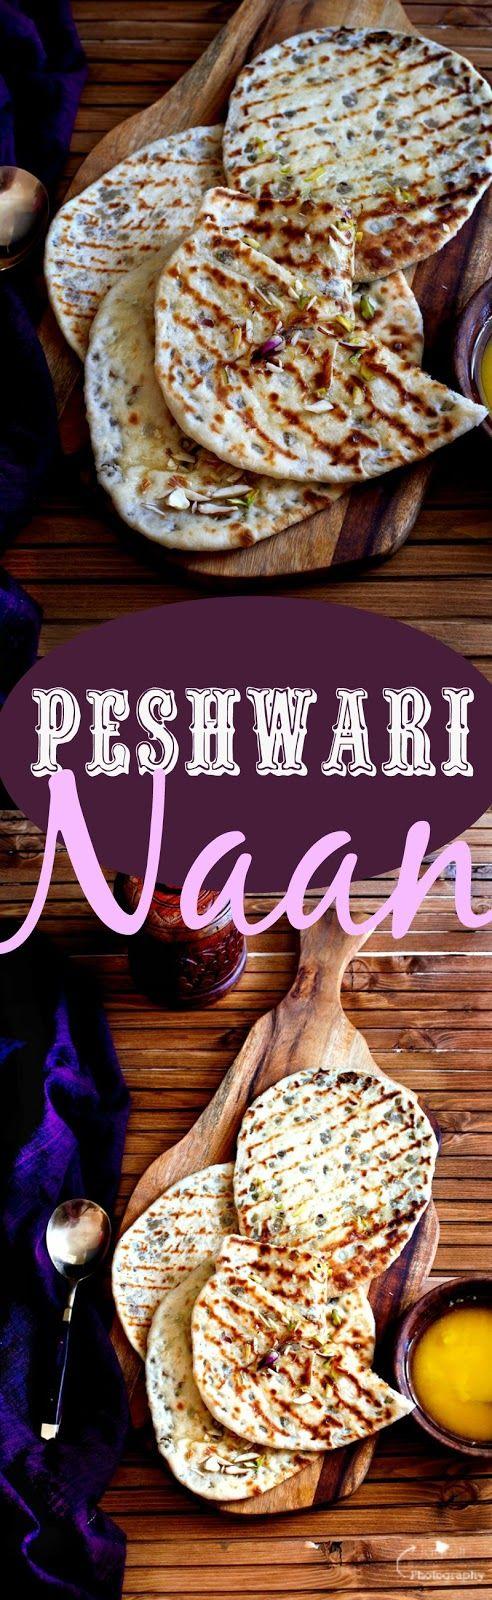 Jagruti's Cooking Odyssey: Peshwari Naan - Indian leavened Bread stuffed with fruit and nuts